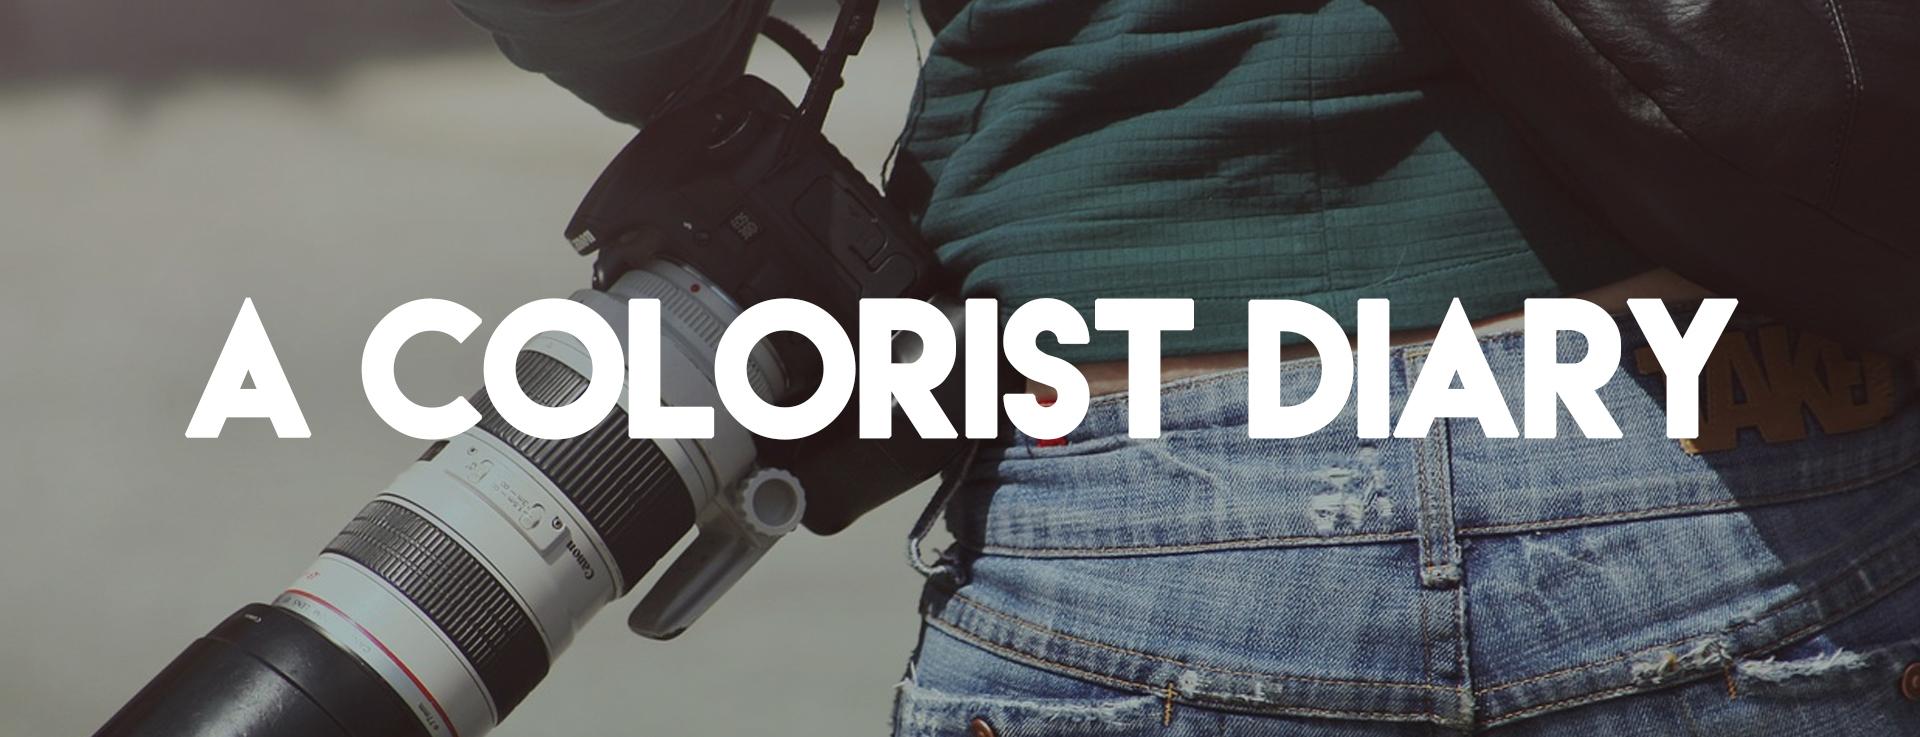 Sylvain Berard - A Colorist Diary